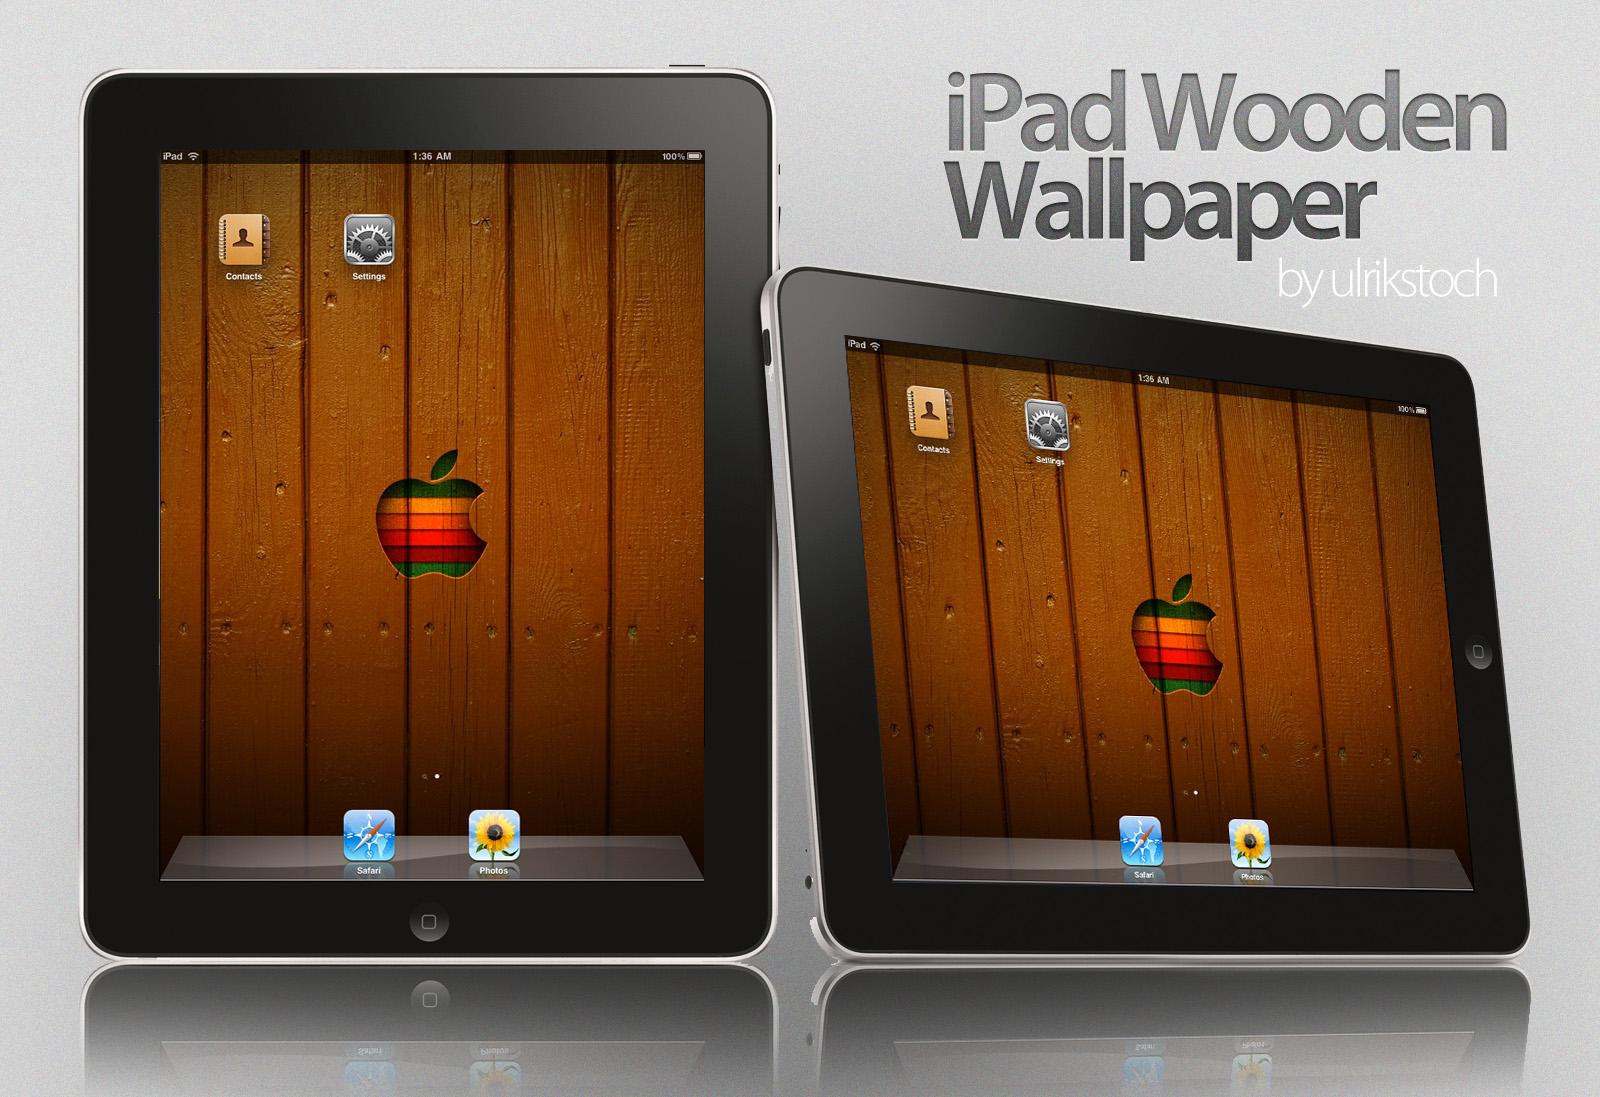 iPad Wooden Wallpaper